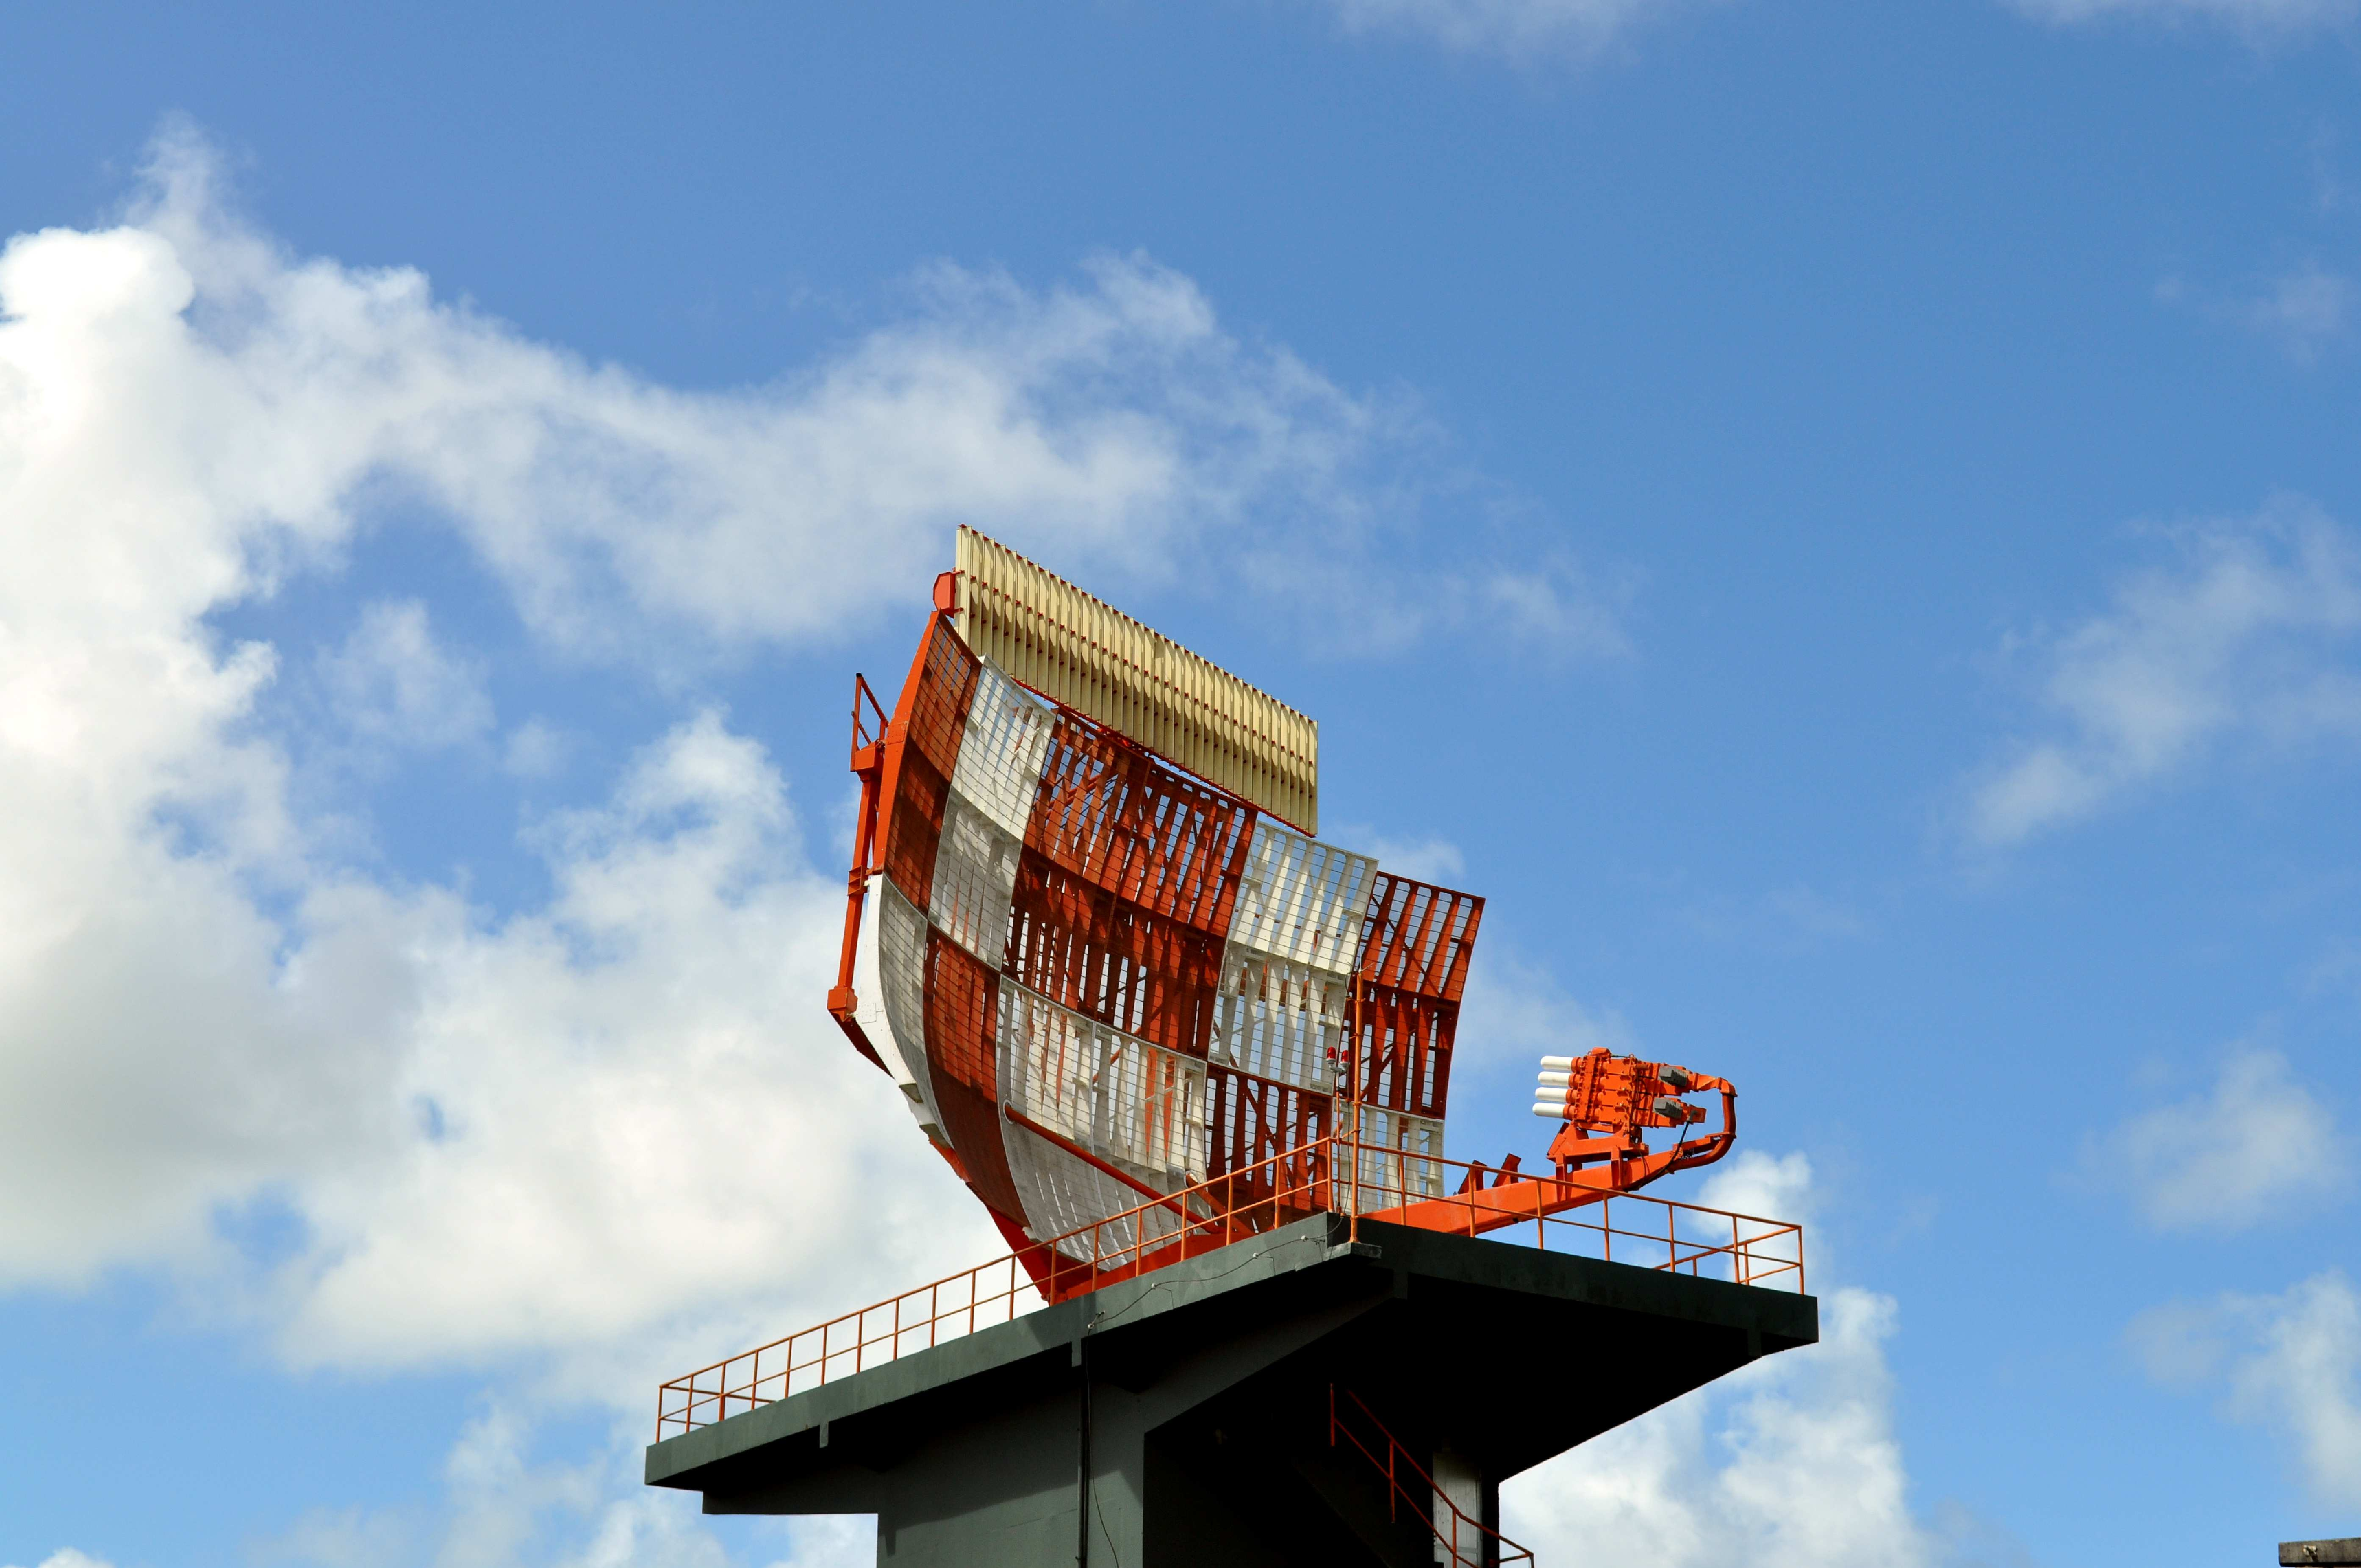 Free photograph; tele, electronic, navigation, device, antenna, radar